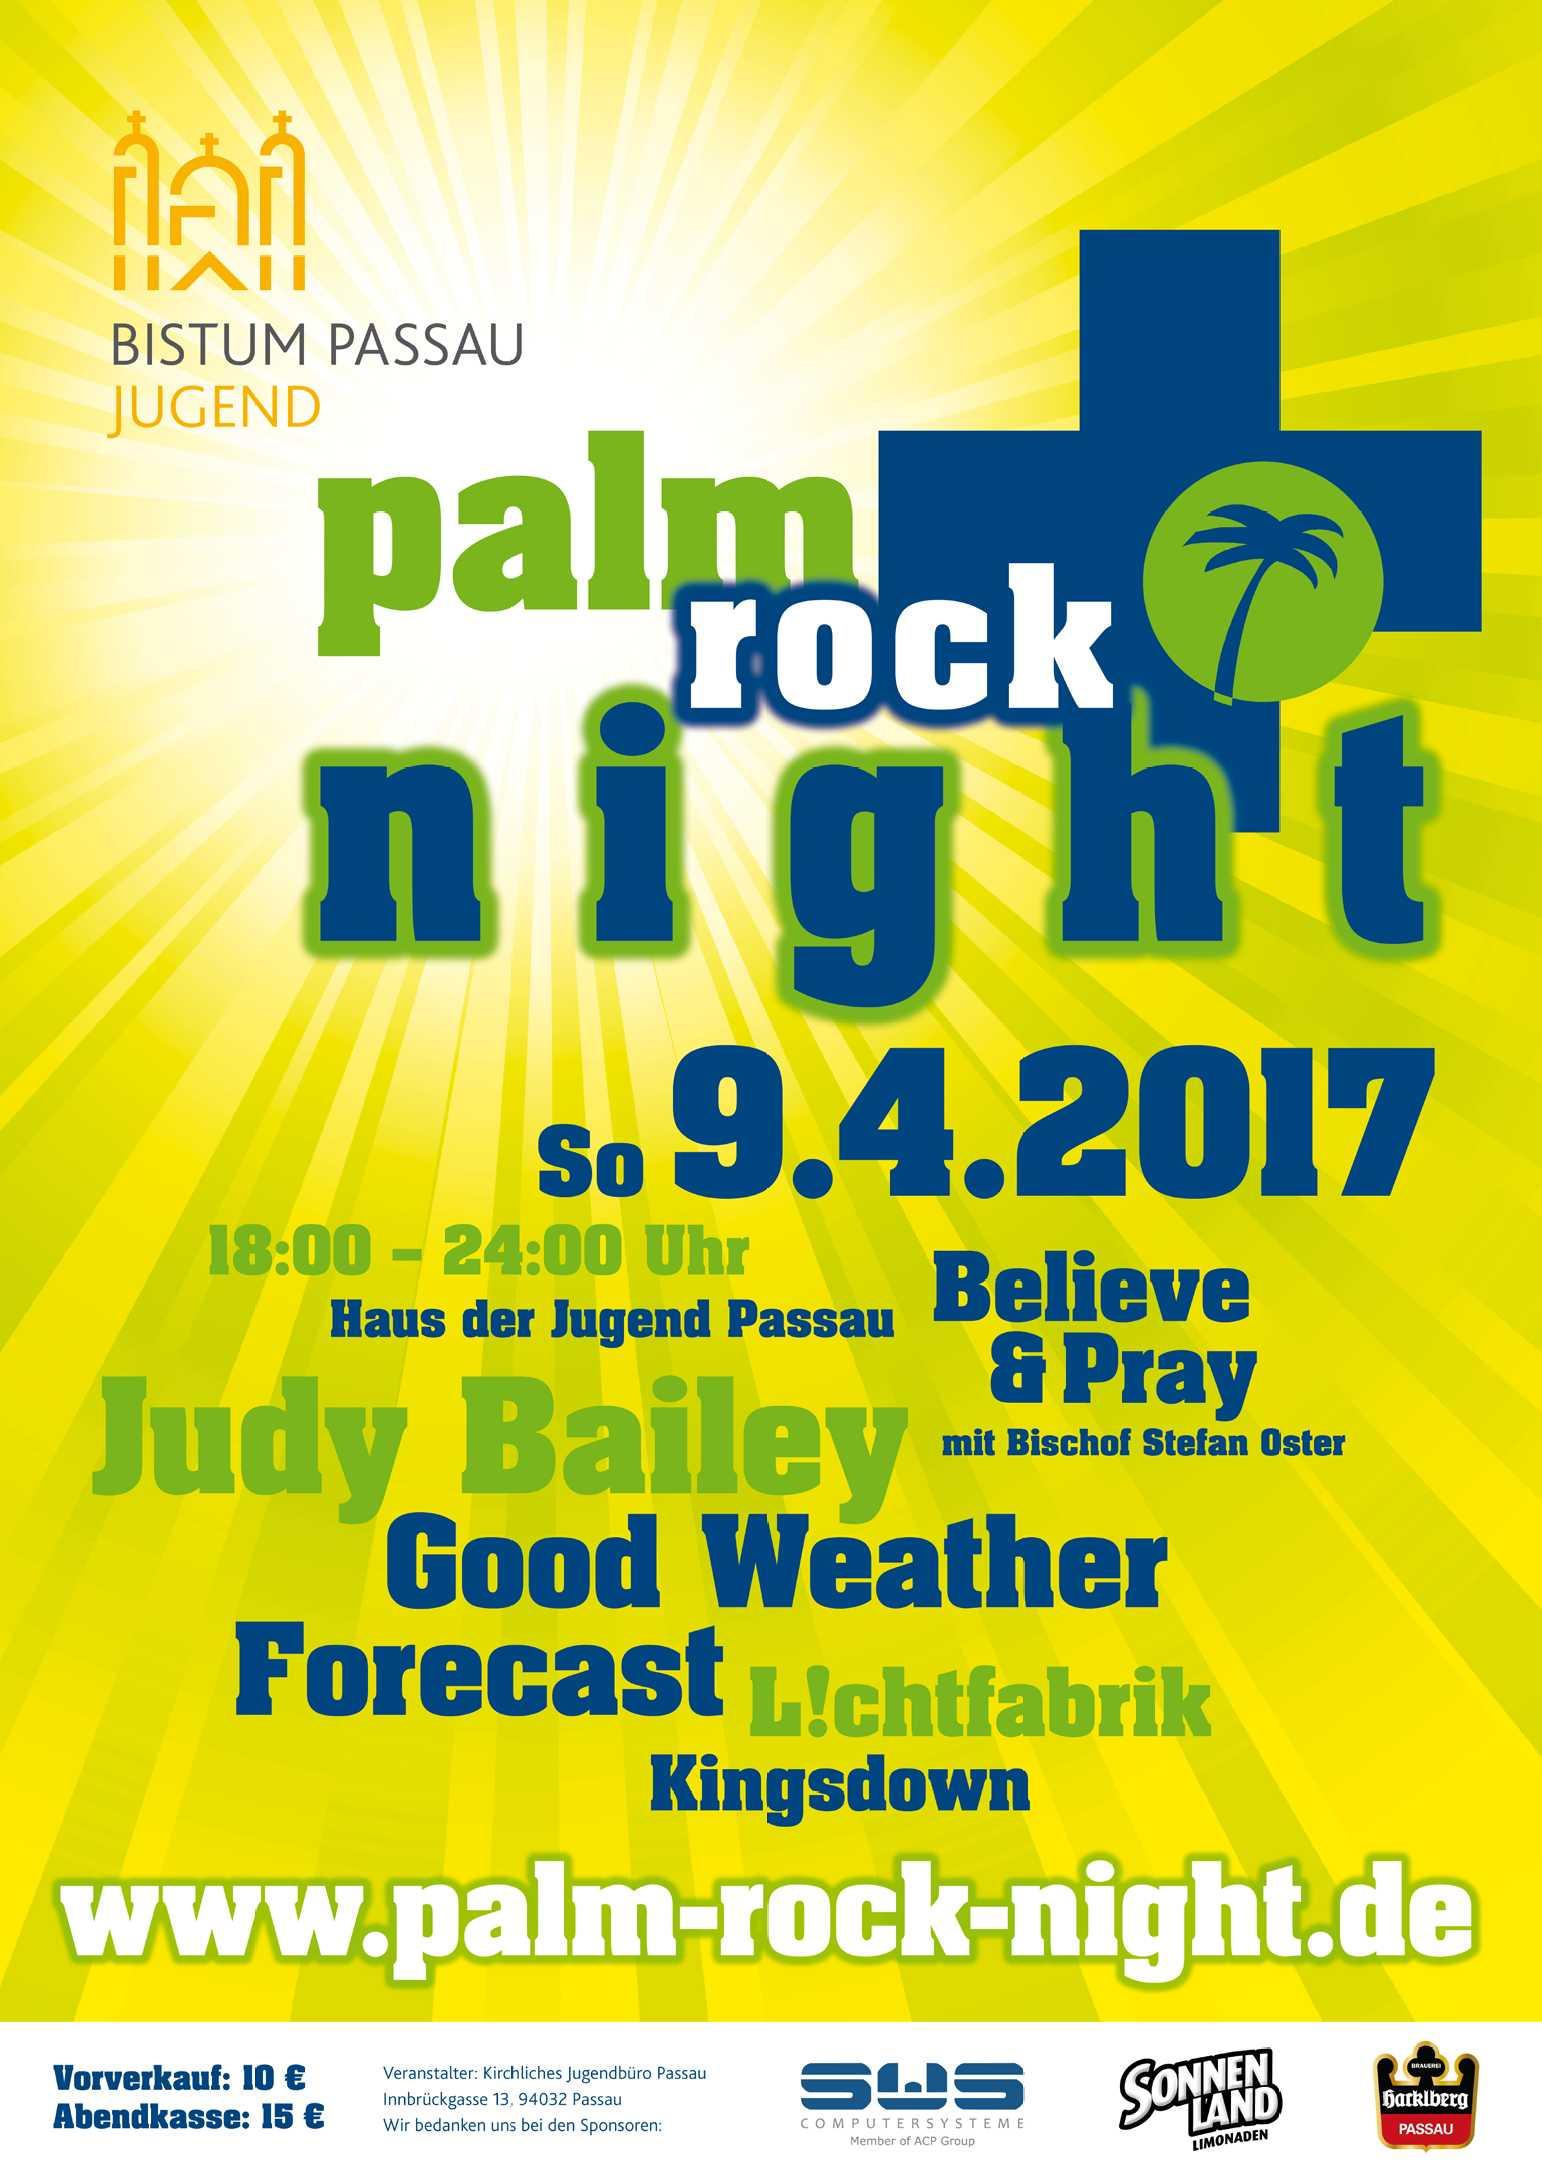 Palm Rock Night Mit Believe N Pray Stefan Oster Sdb